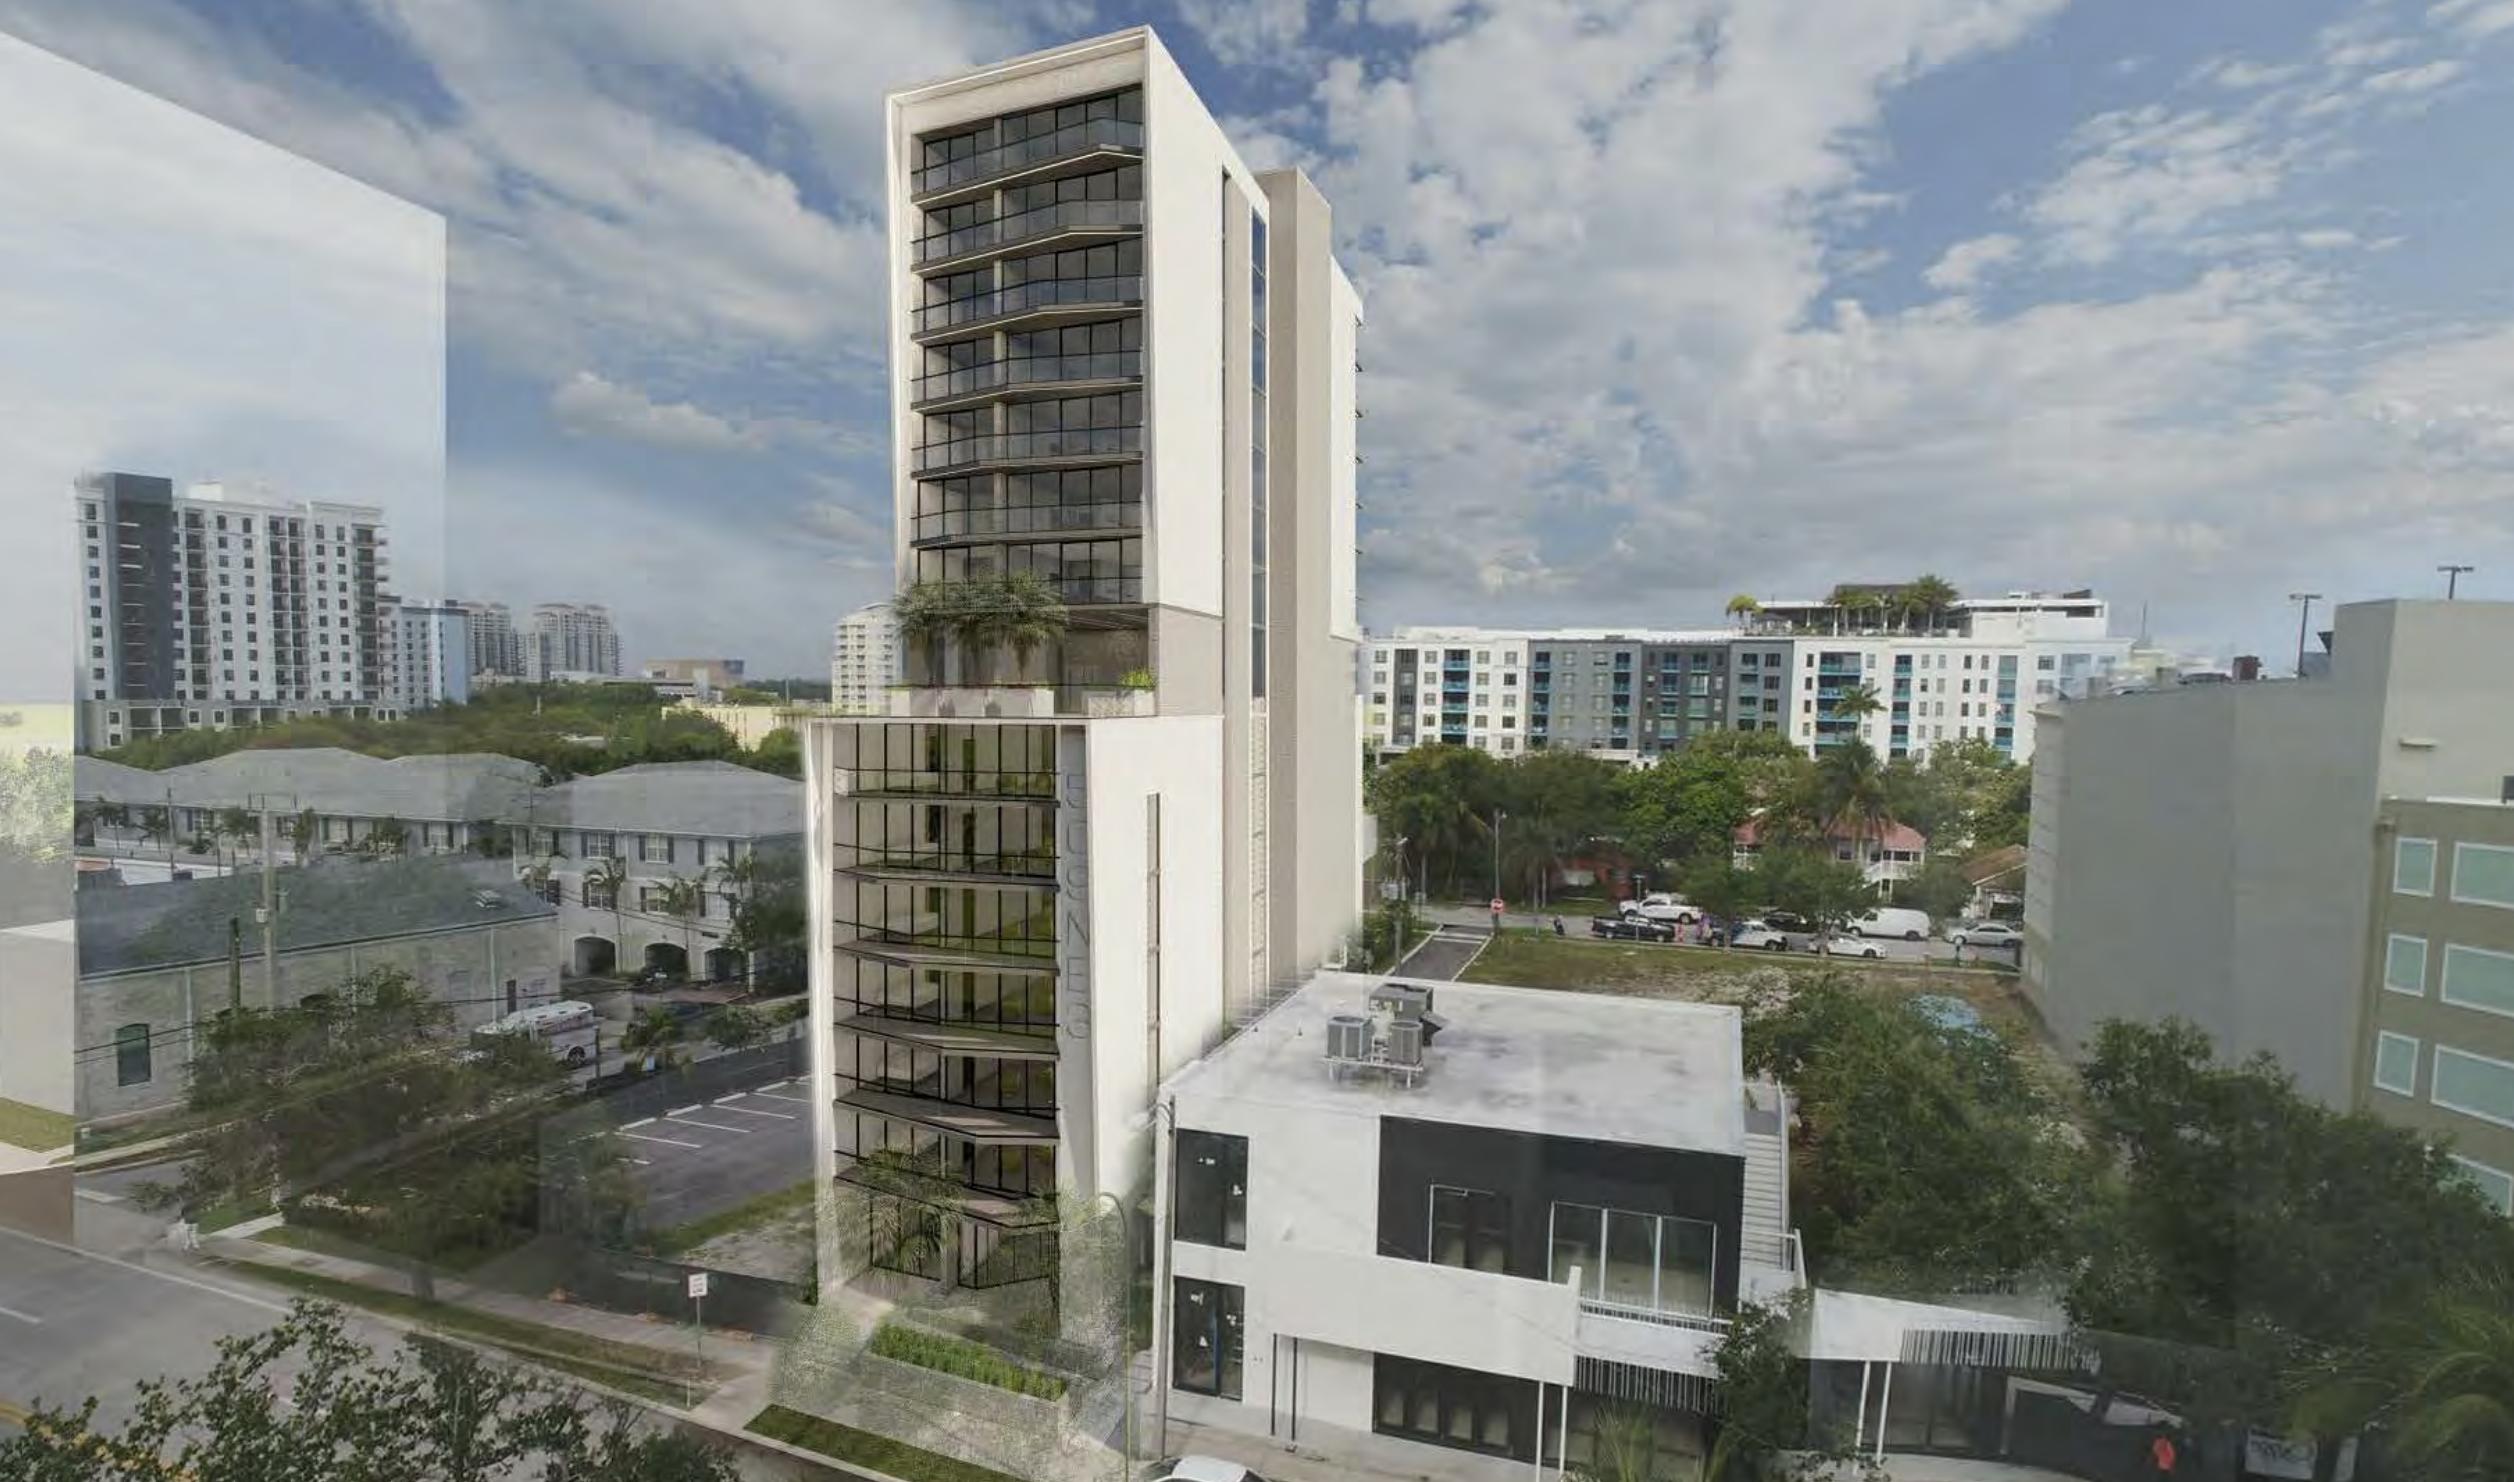 509NE3 Condominiums. Designed by the Tamara Peacock Company Architects